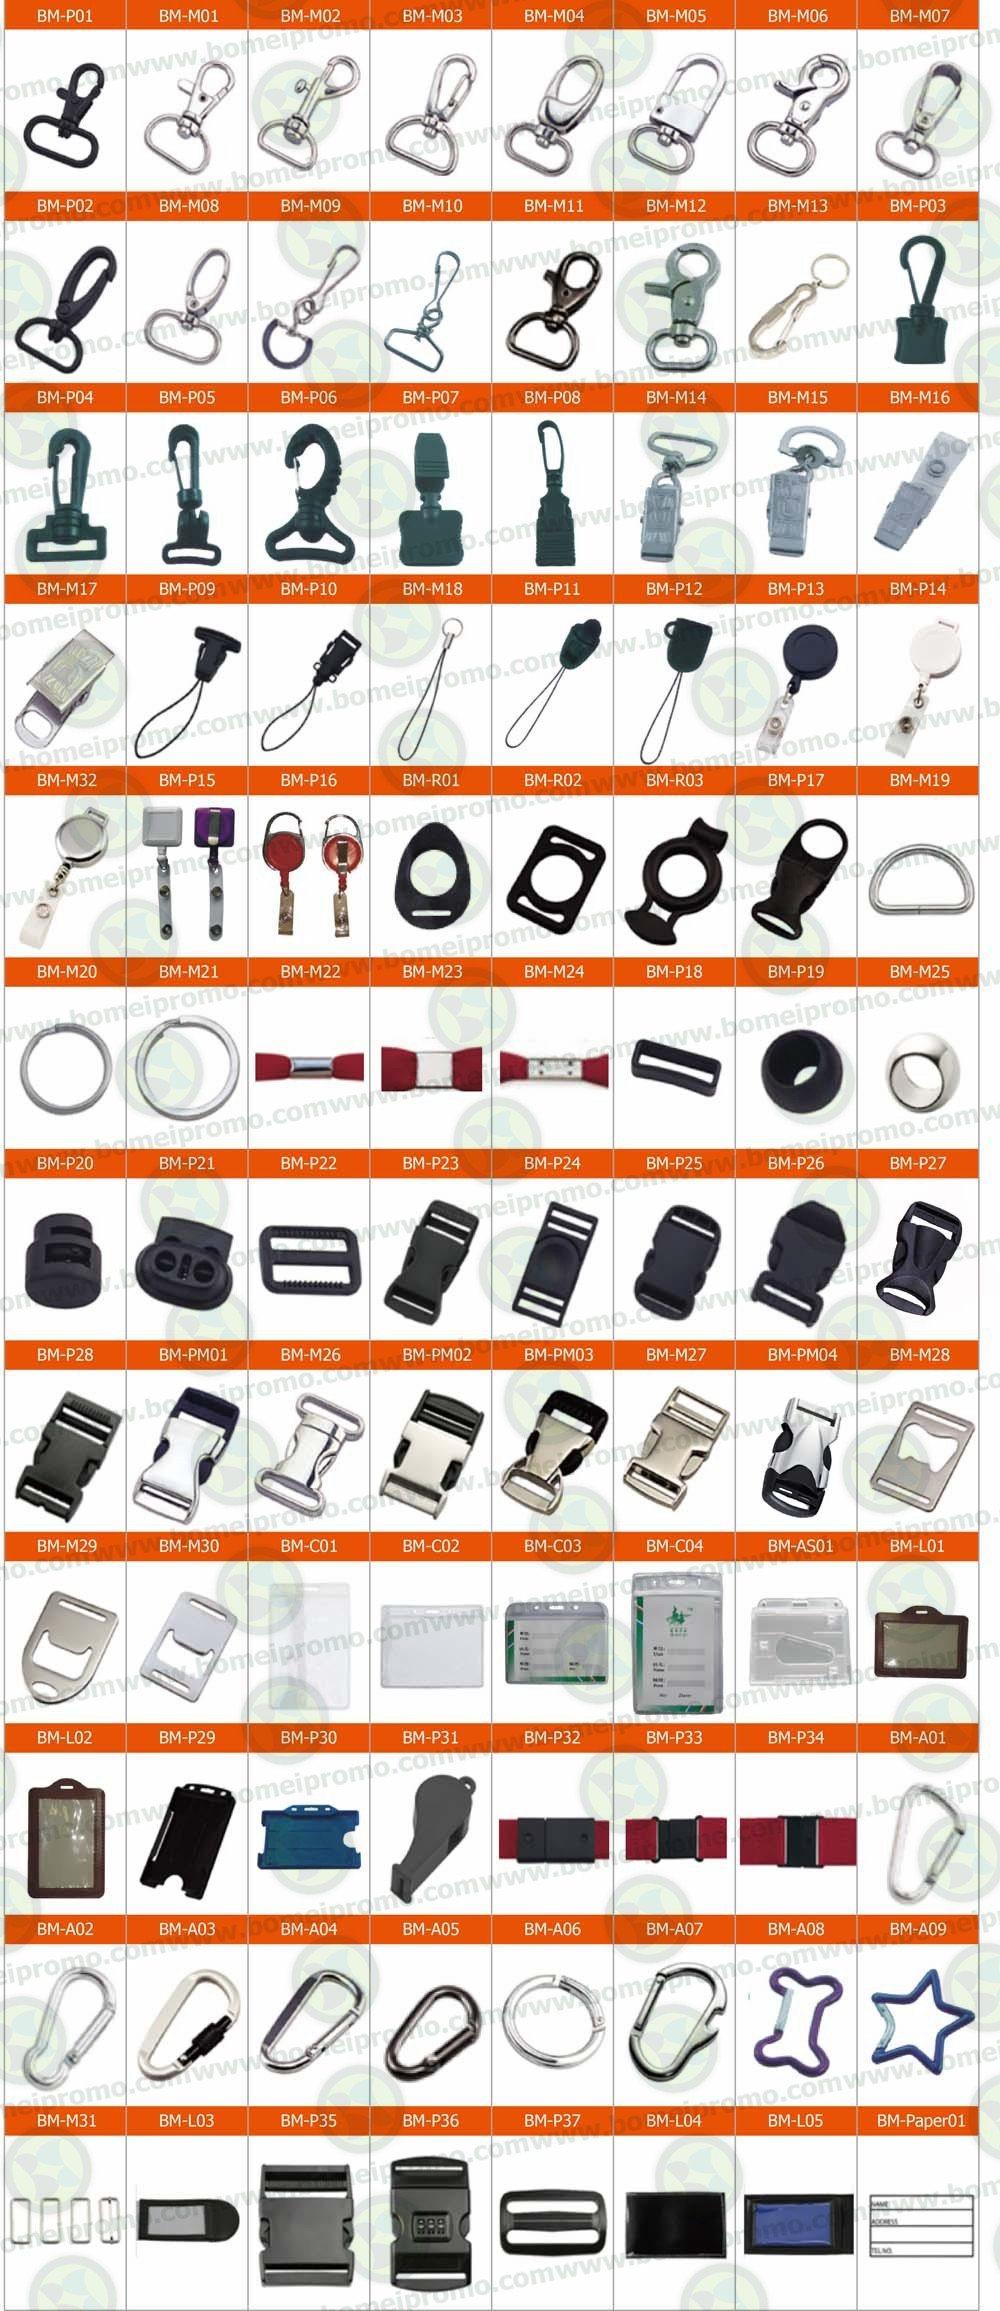 Silicone Wrist Band Silicone Keychain Wristband Keyring Rubber Key Chain